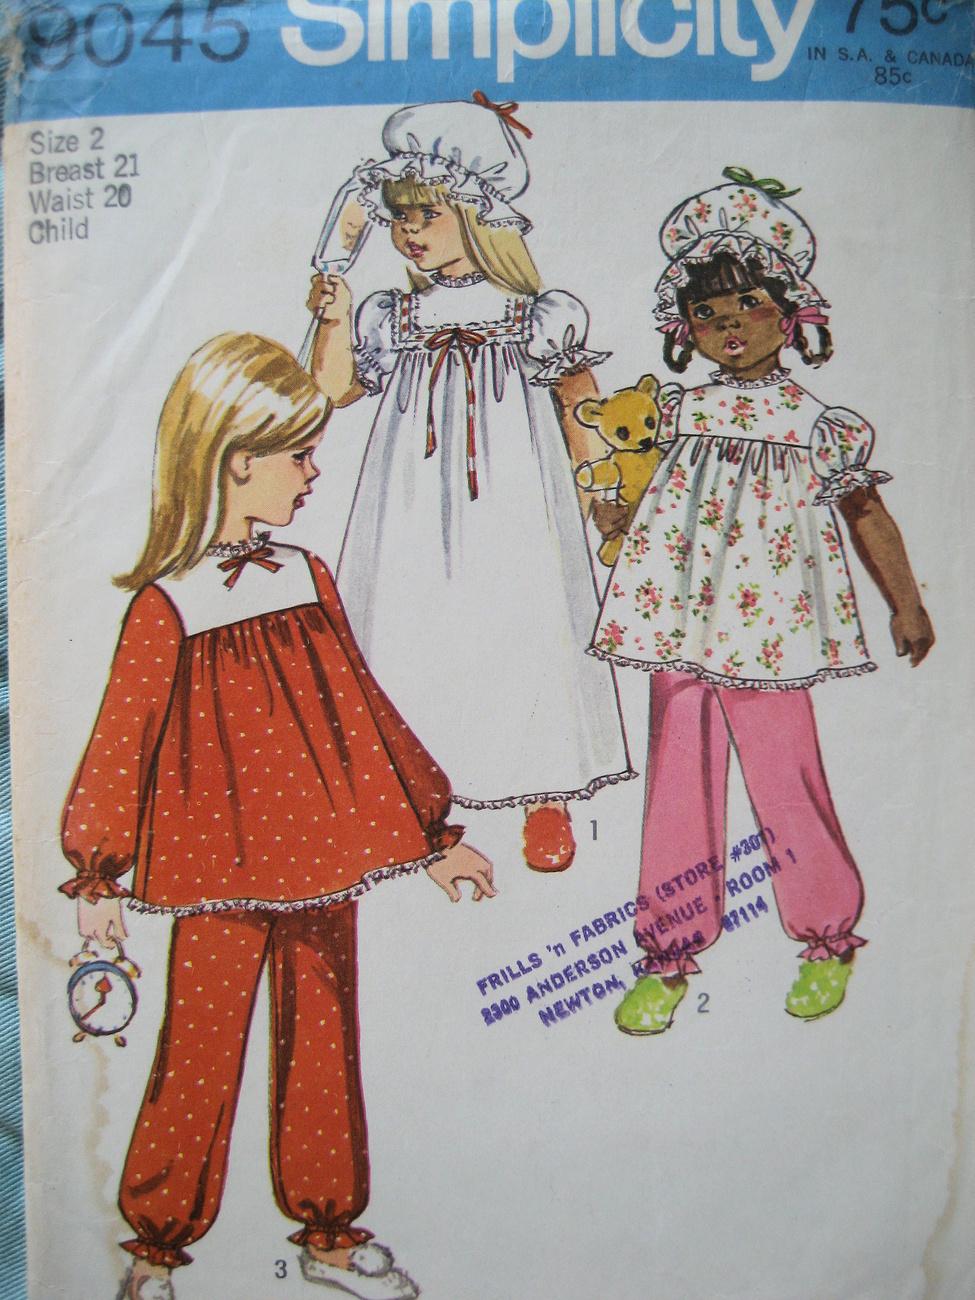 Vintage70s Pattern Girls Size 2  PJs Nightcap S9045 Simplicity New Look